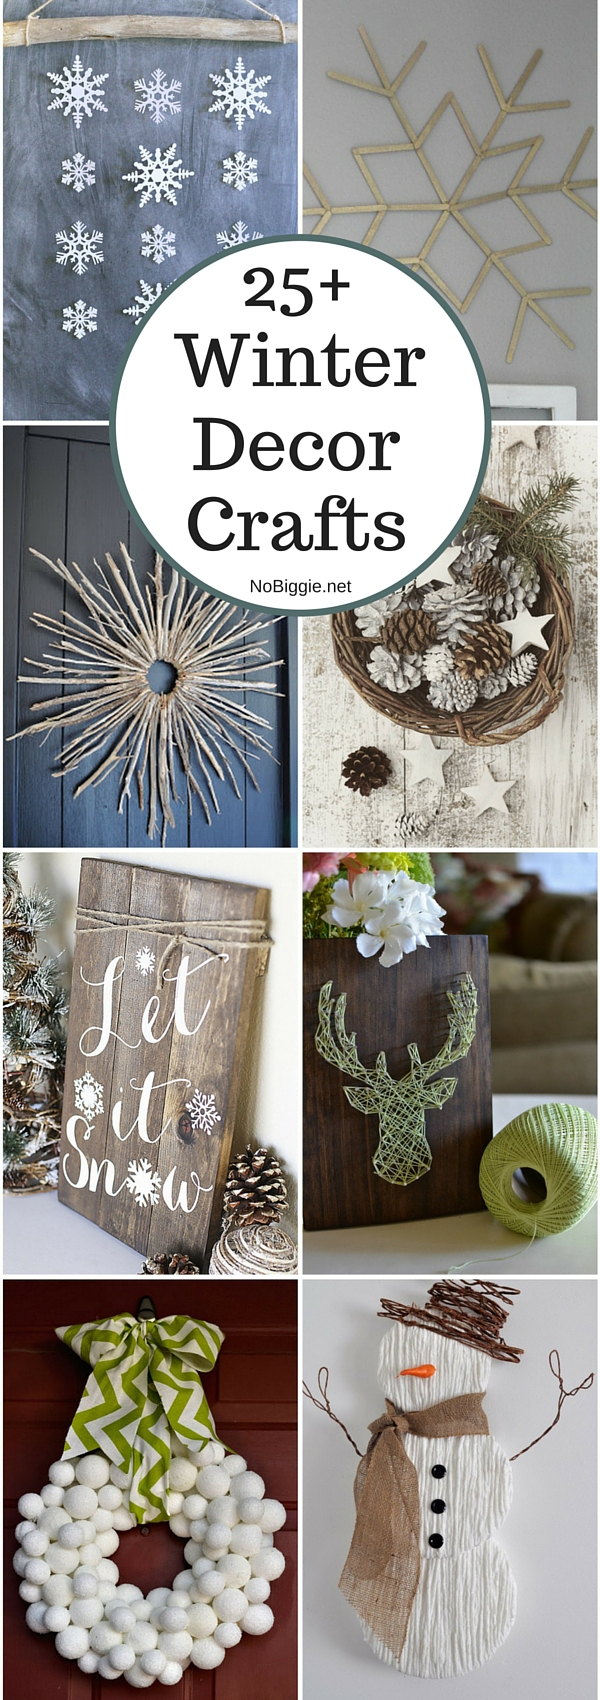 25+ Winter decor crafts | NoBiggie.net